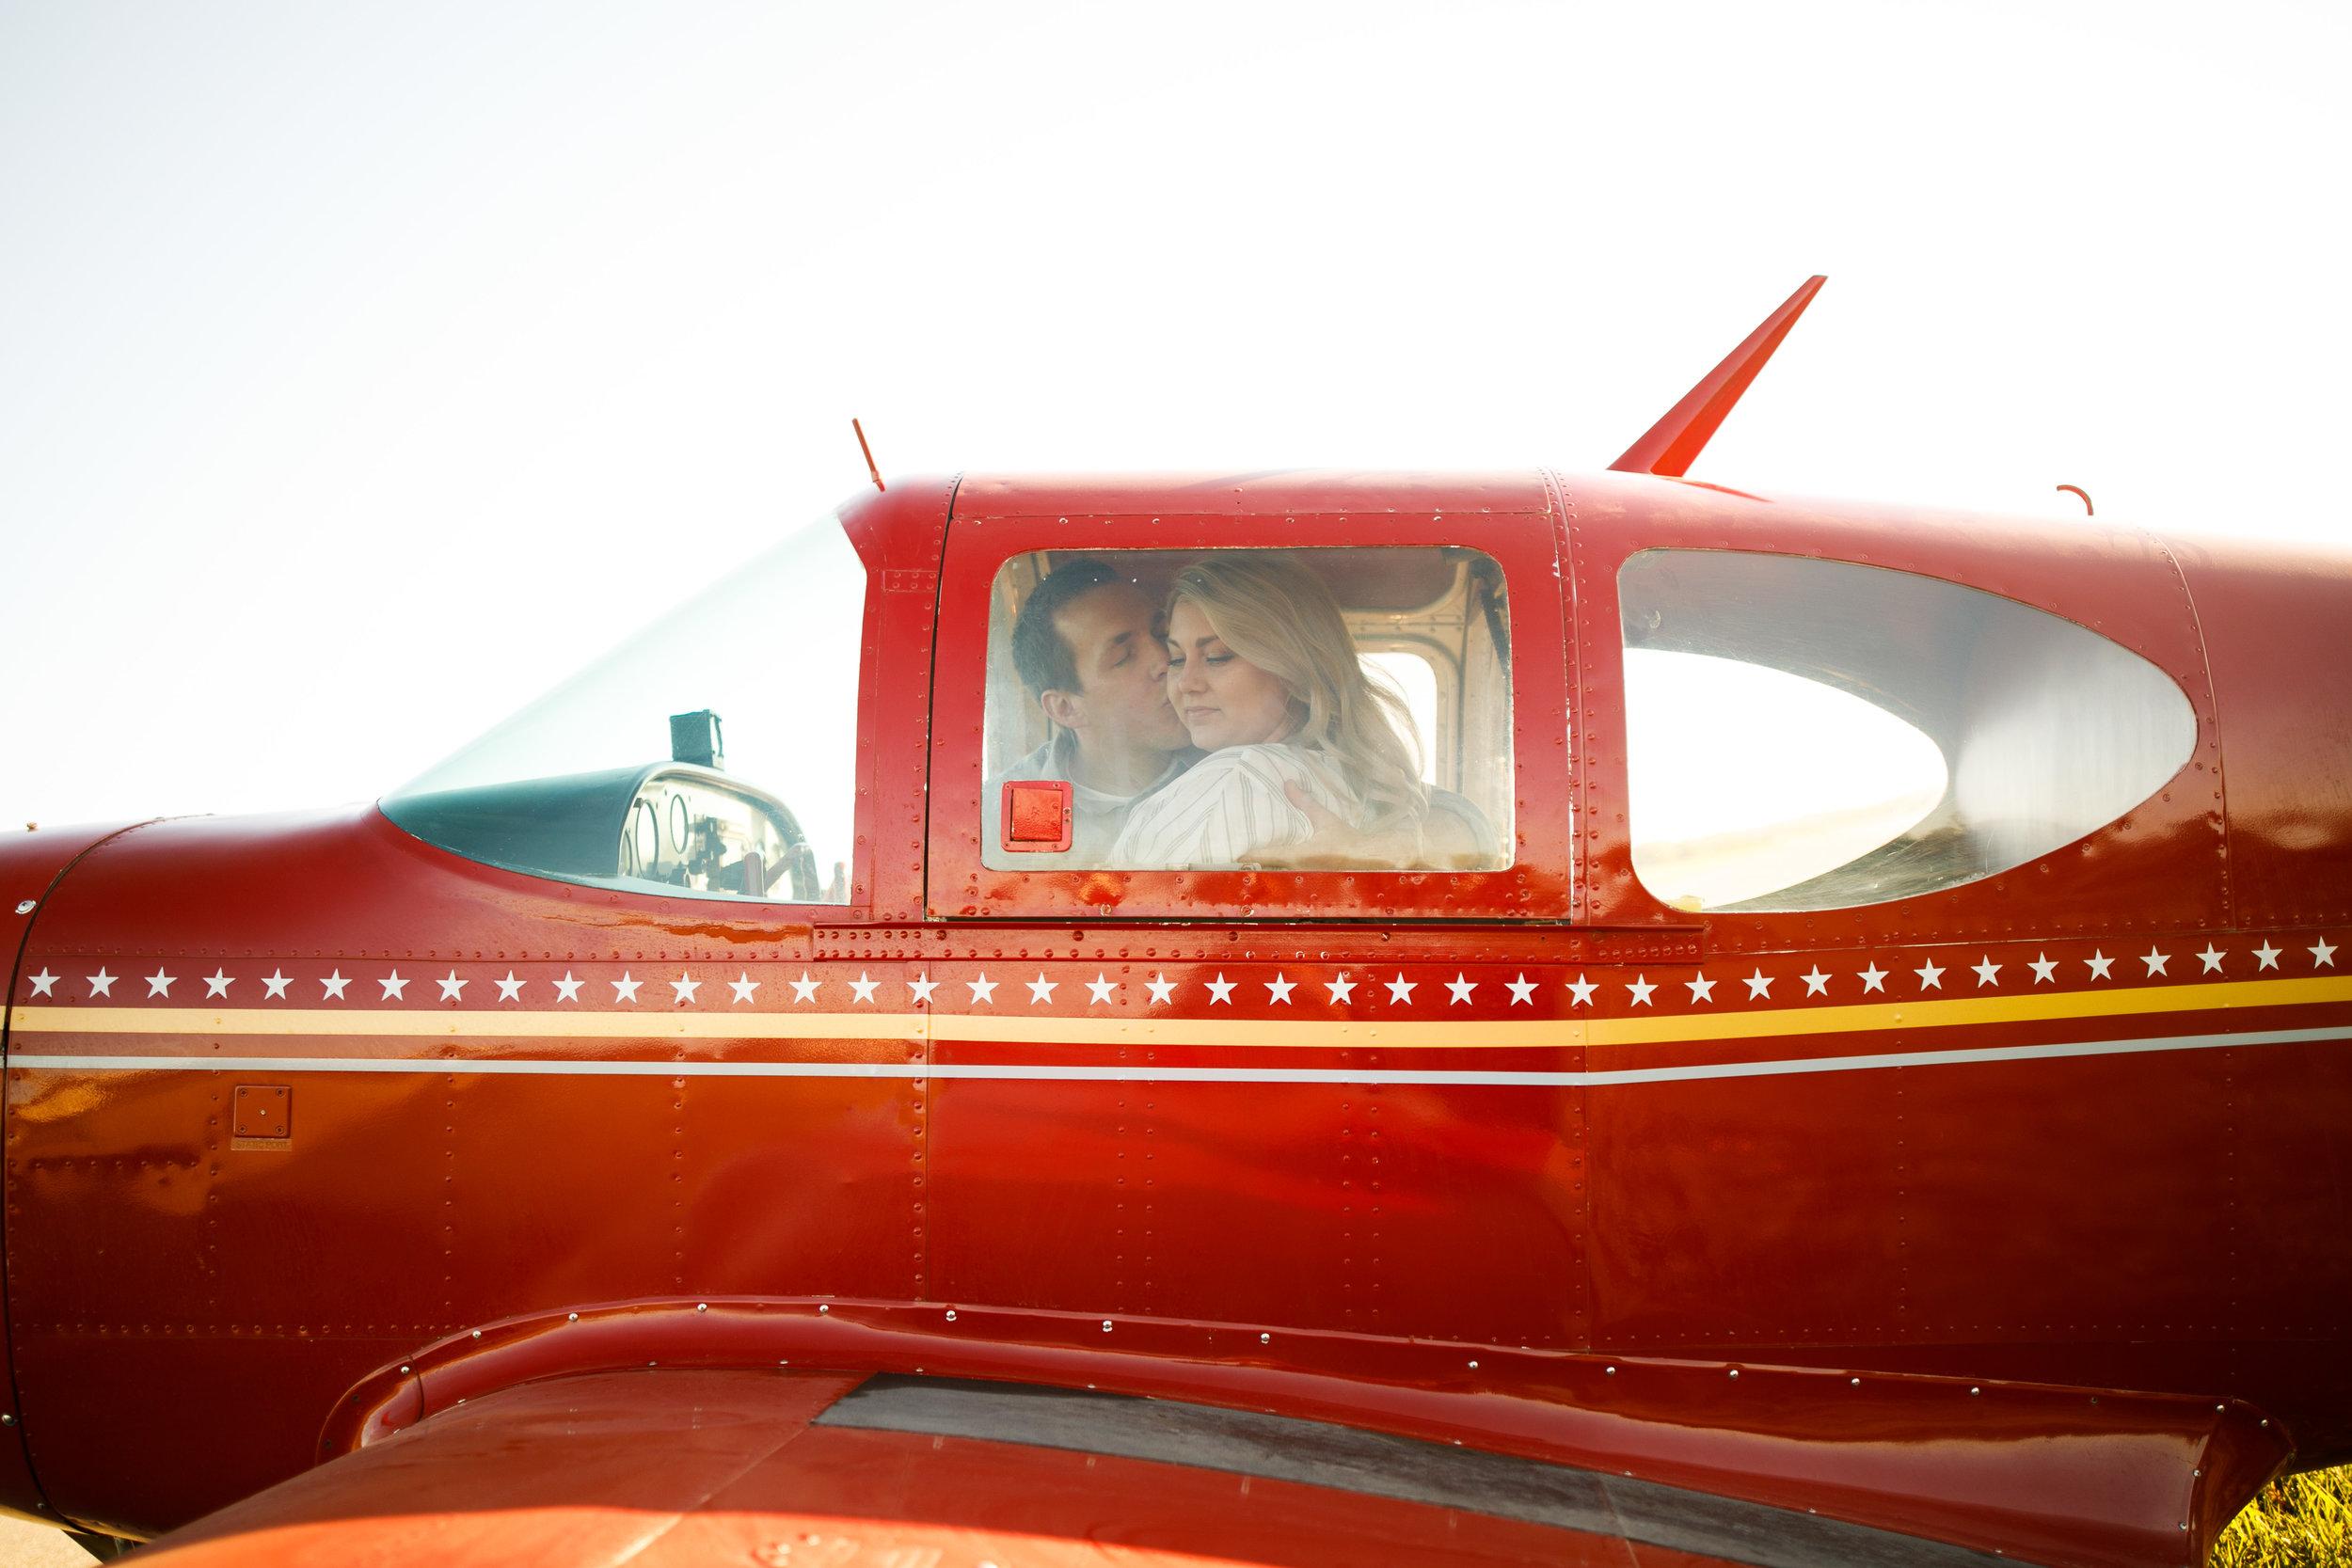 Grand Rapids Photographer - J Darling Photo - jessica darling - grand rapids wedding photographer - sparta airport - sparta michigan - jasmine and jeff engaged 037.jpg